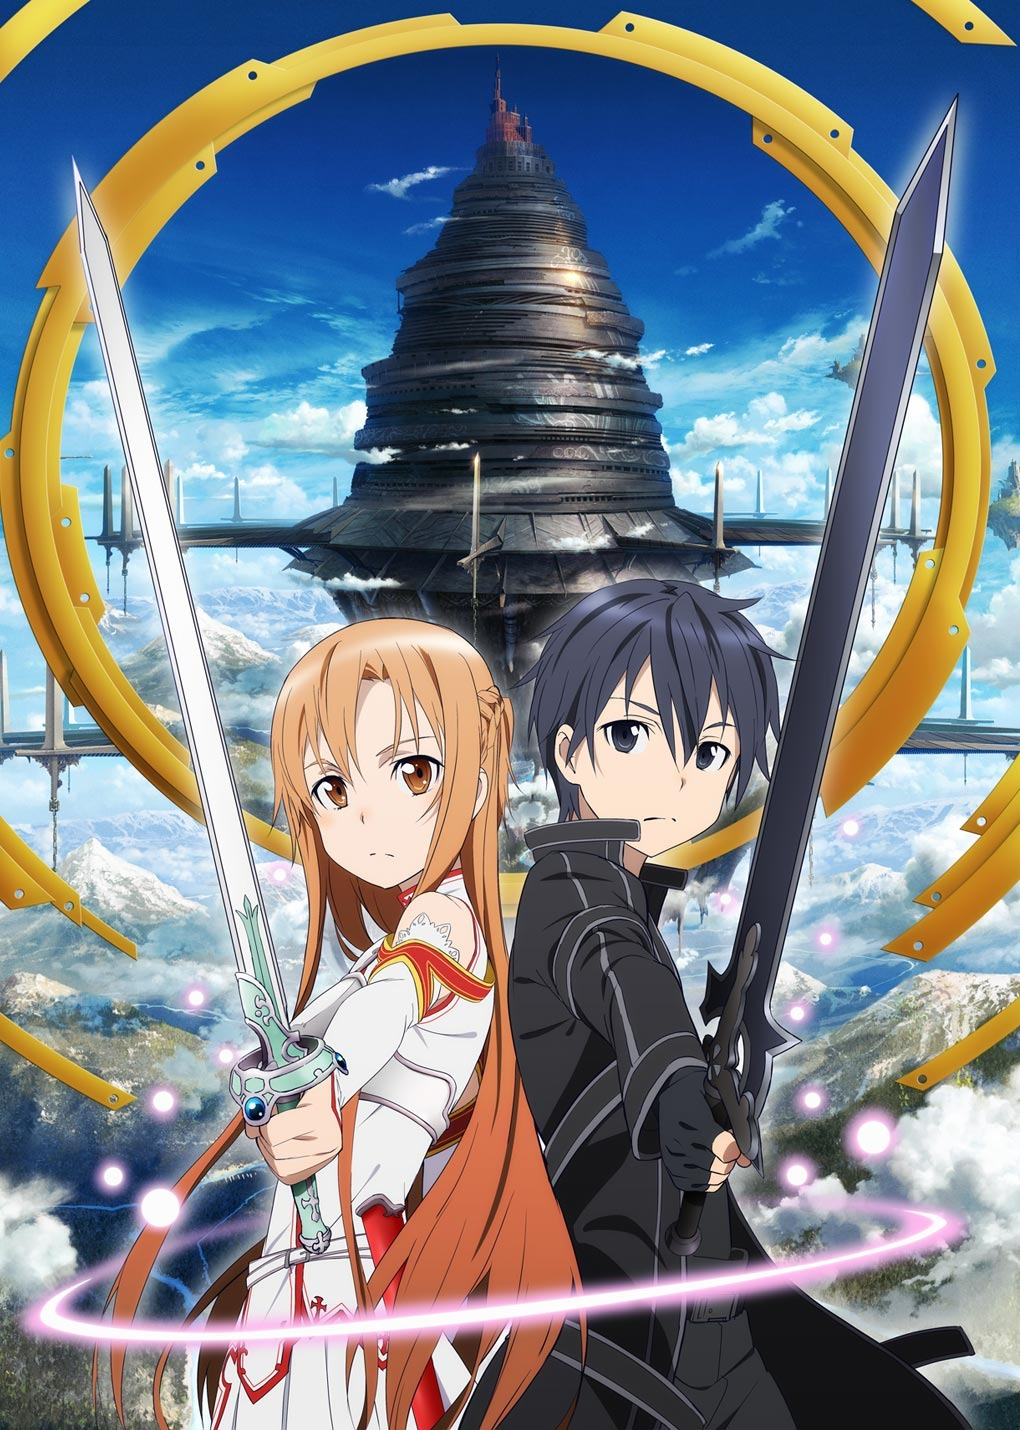 Sword Art Online ซอร์ดอาร์ตออนไลน์ ภาค1 ตอนที่ 1-25 พากย์ไทย [จบแล้ว]